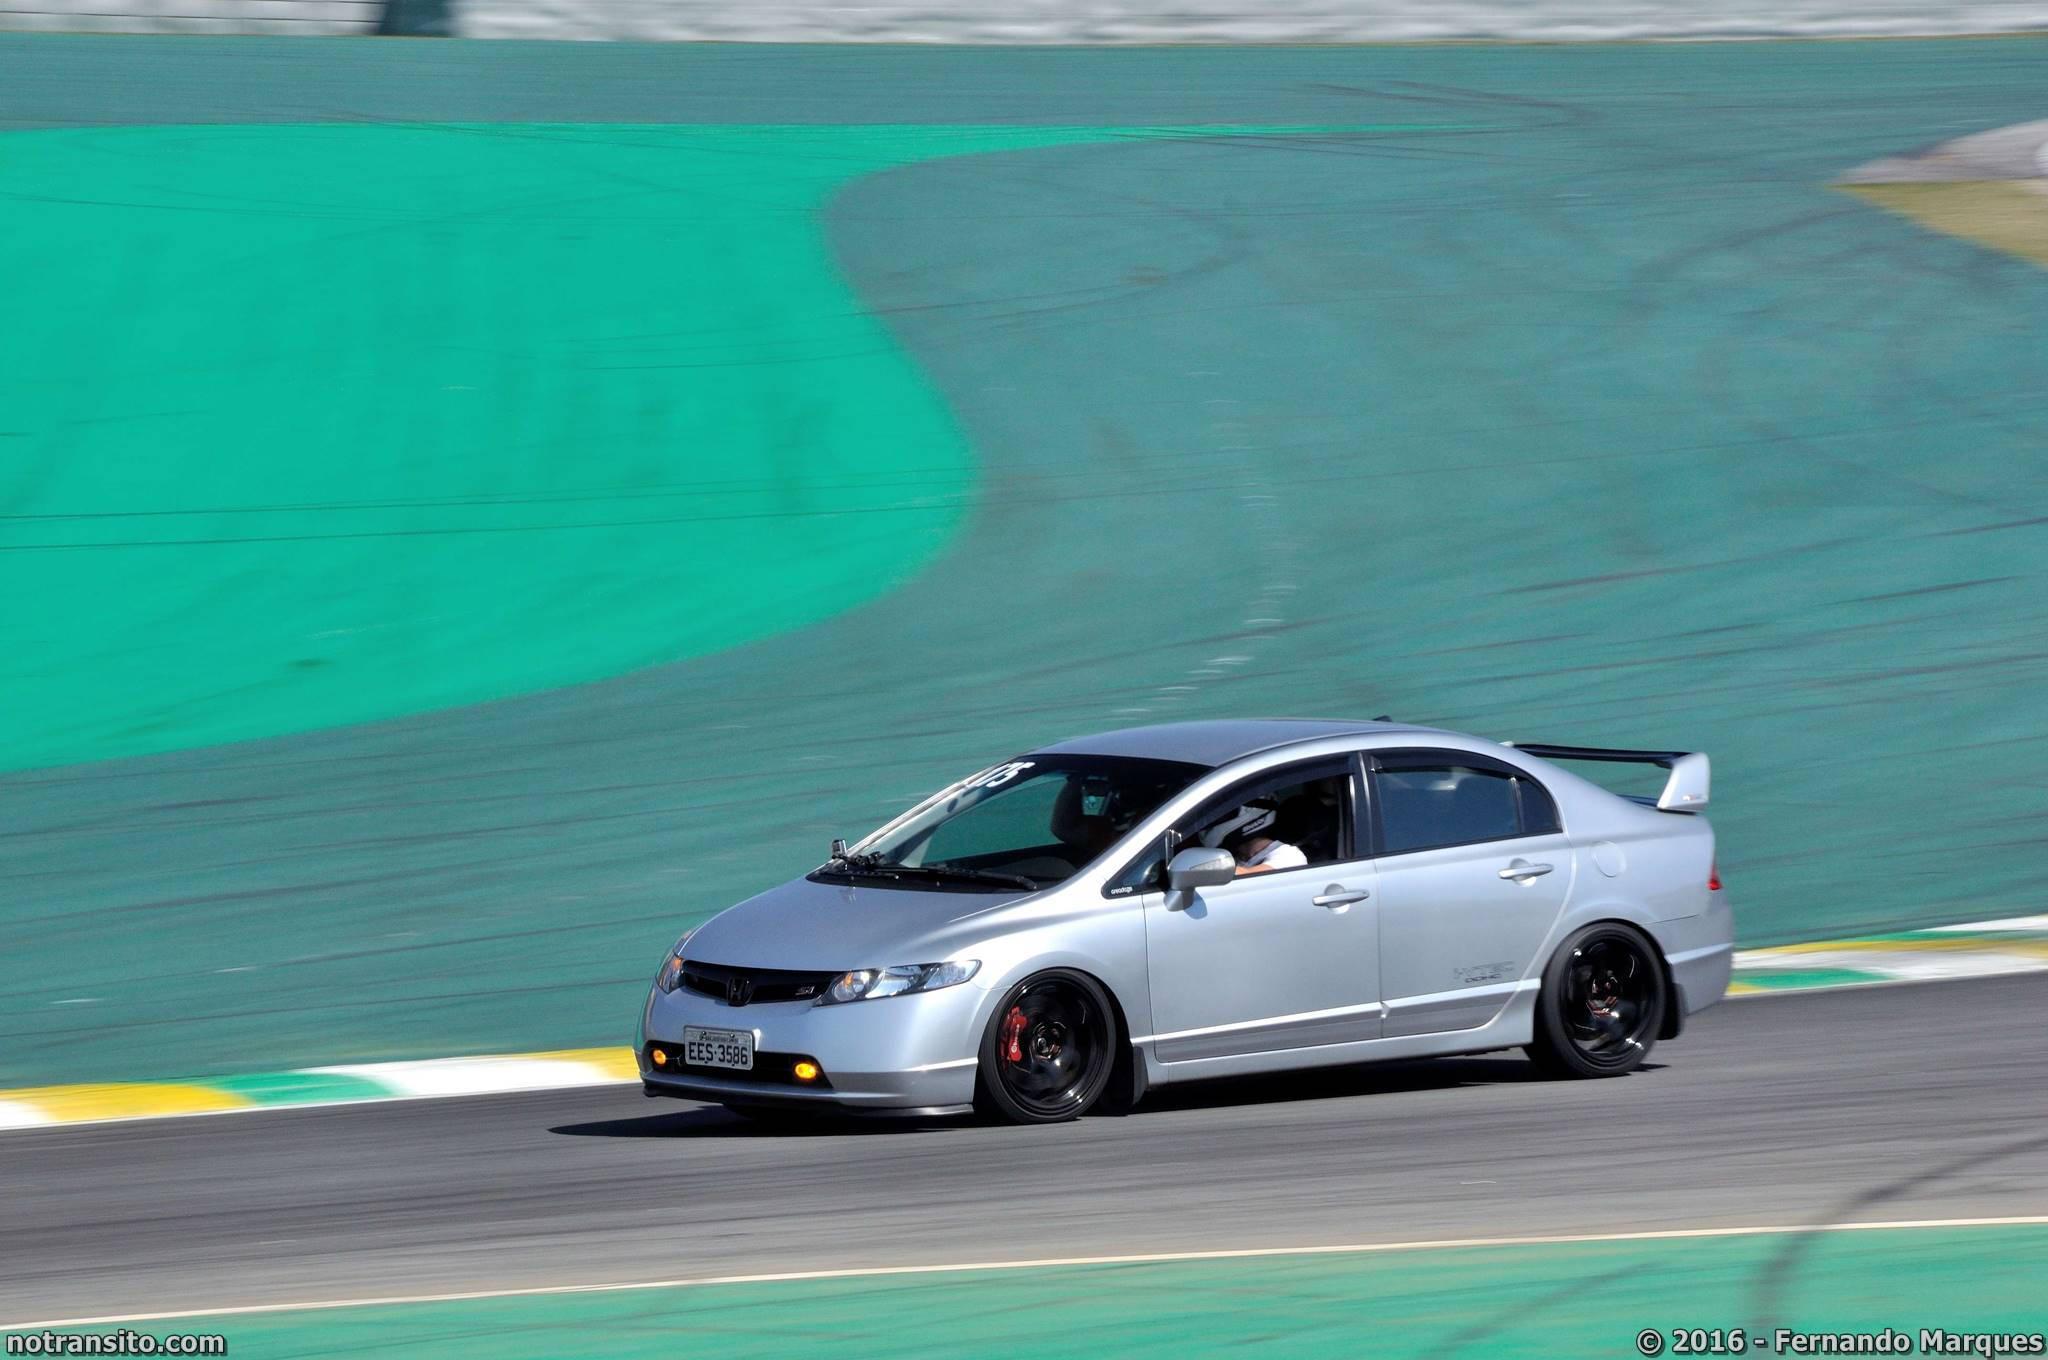 1º TrackDay PetrolEvents, PetrolEvents Interlagos, Trackday Interlagos